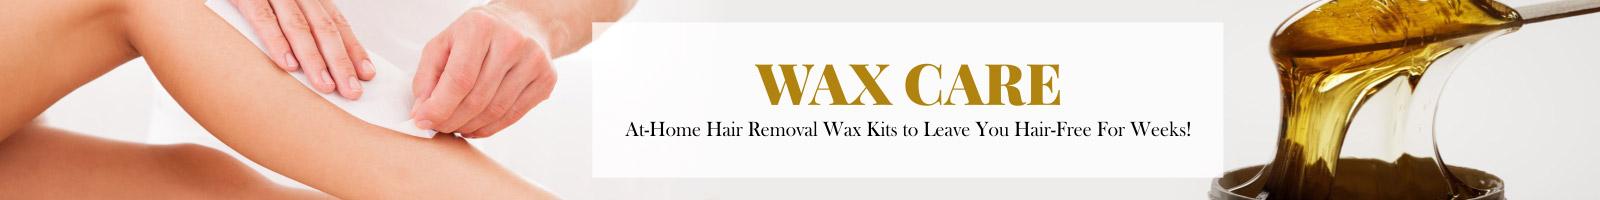 Waxing Care